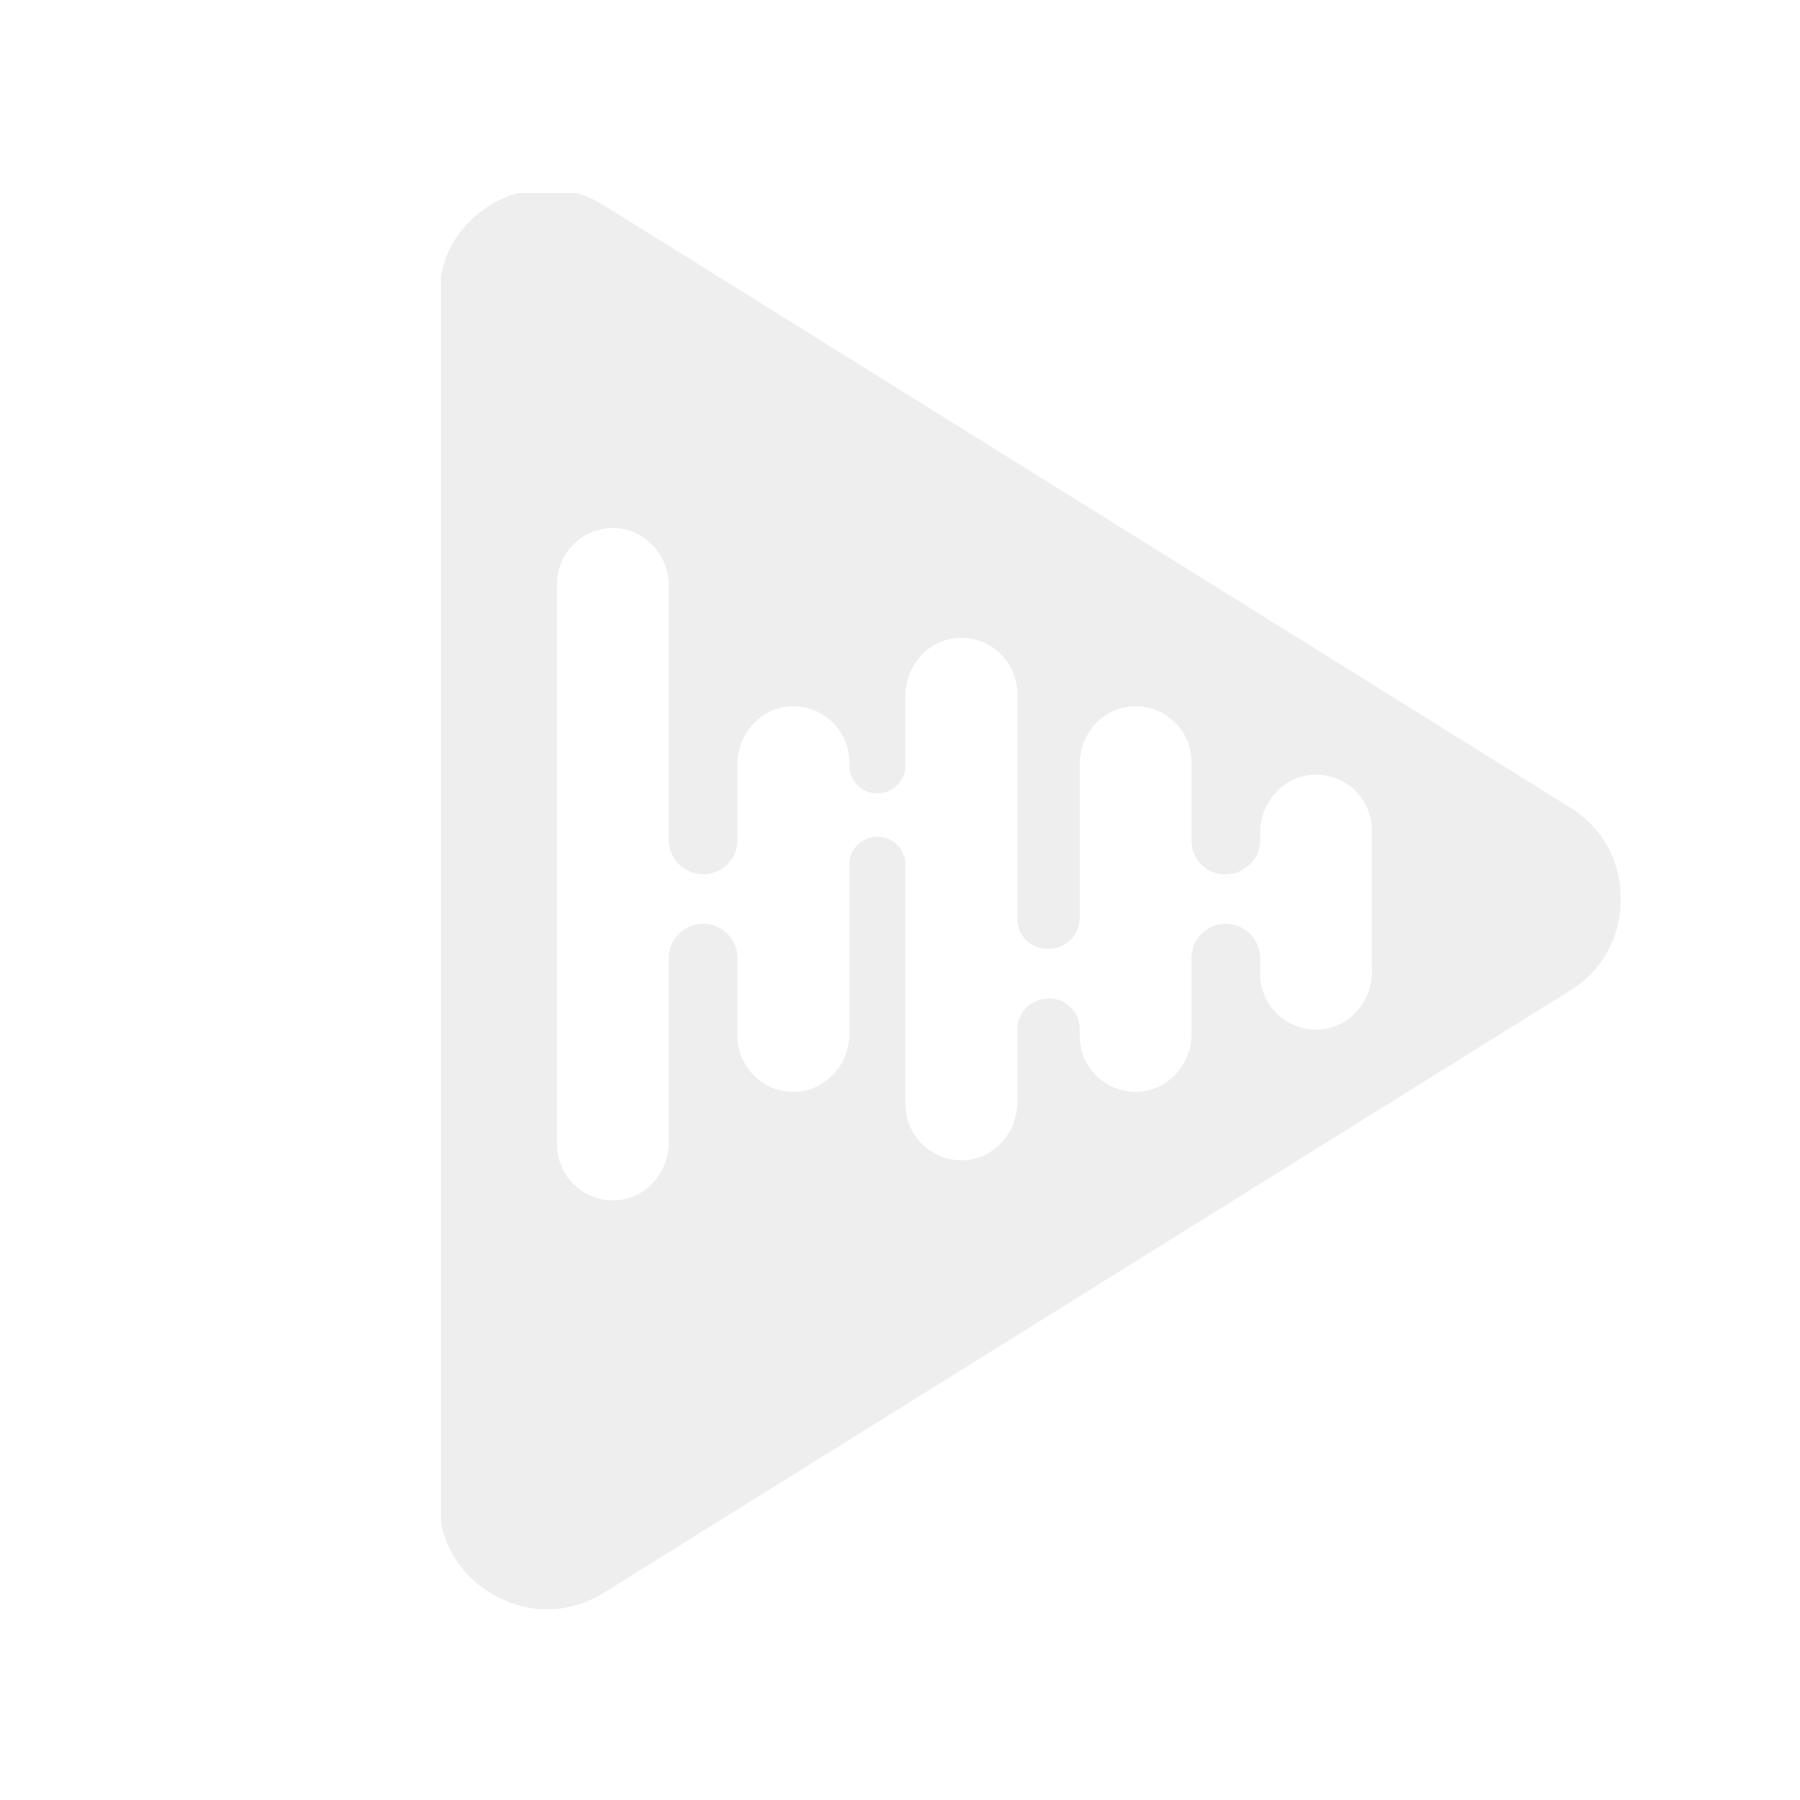 Hertz Dieci E15SV-DS38 - 15